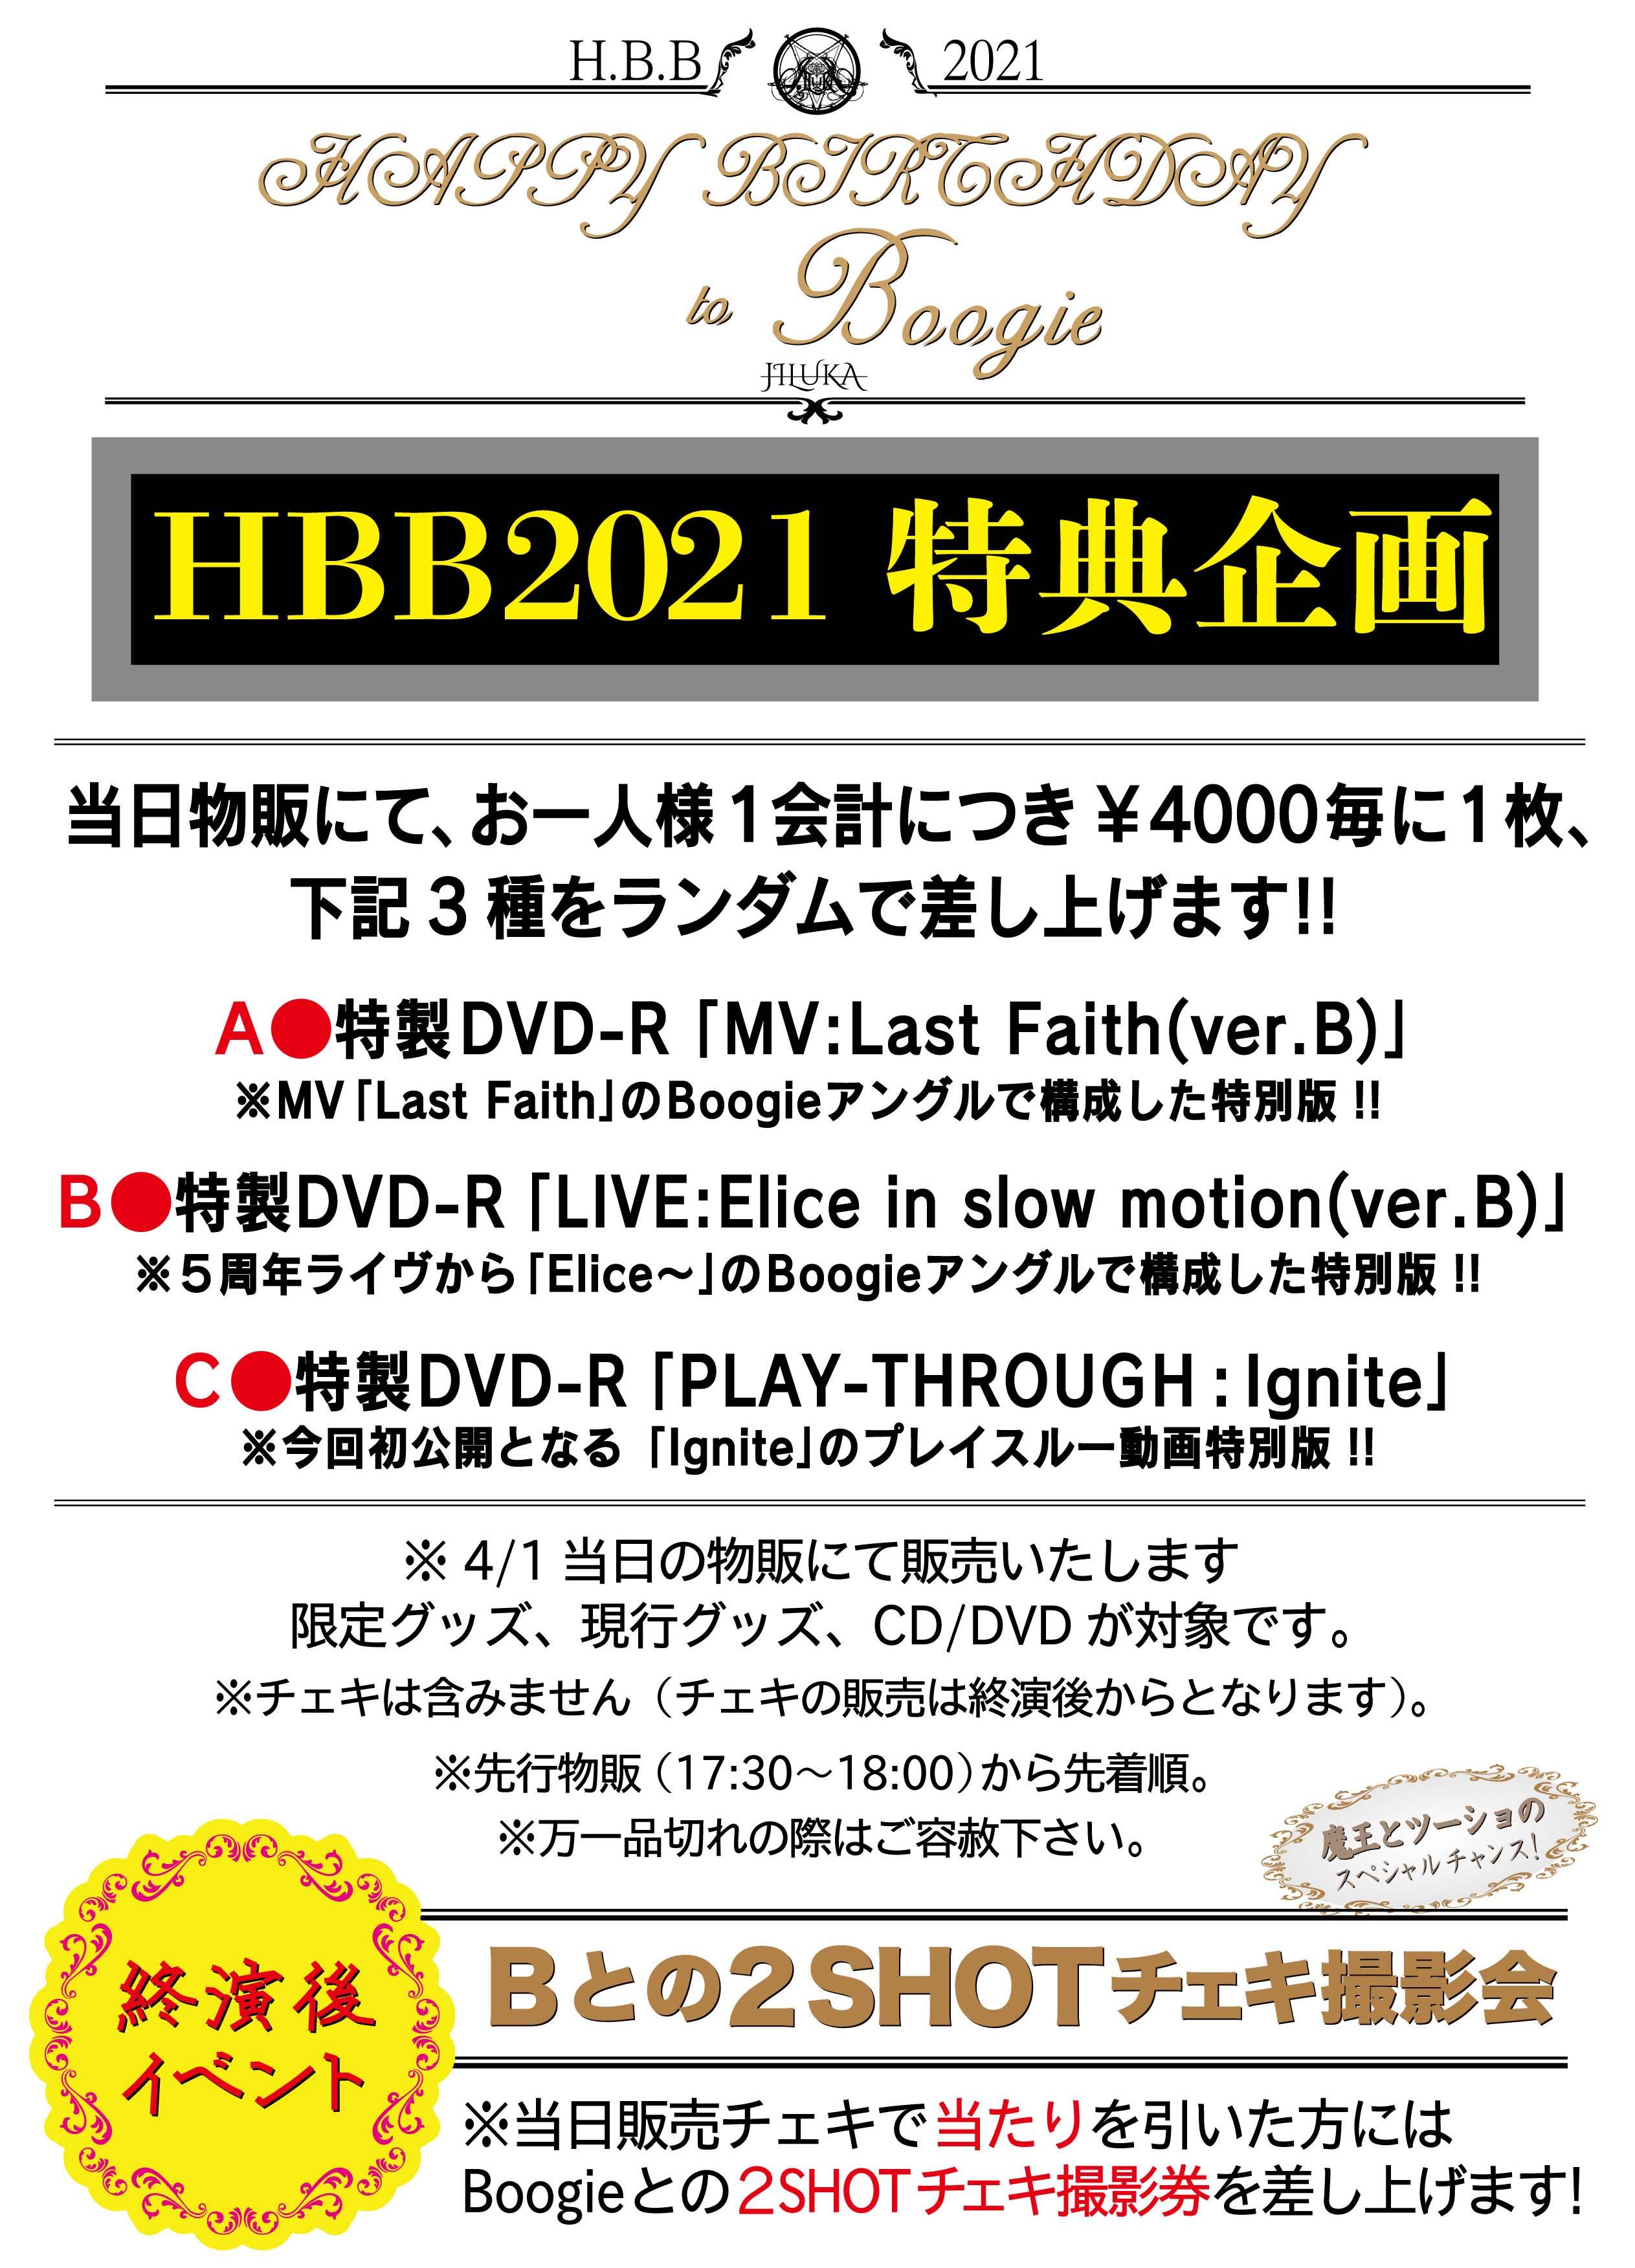 HBZ2021_物販_貼り紙